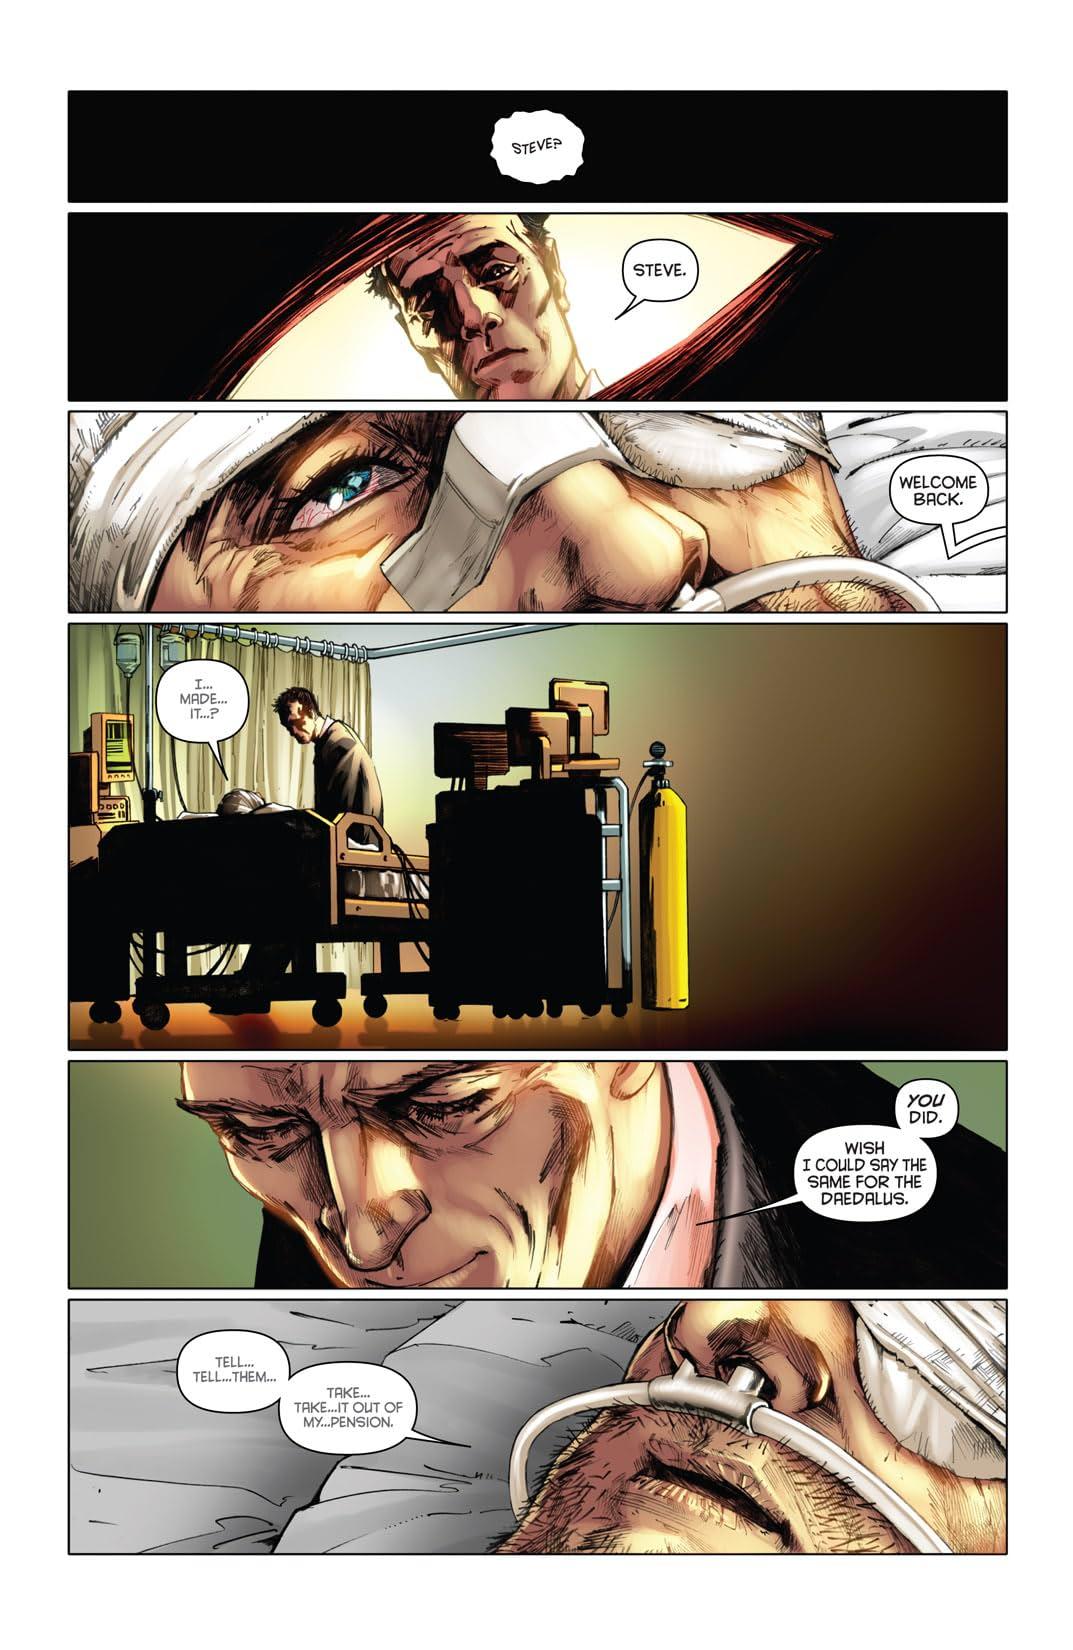 The Bionic Man #3